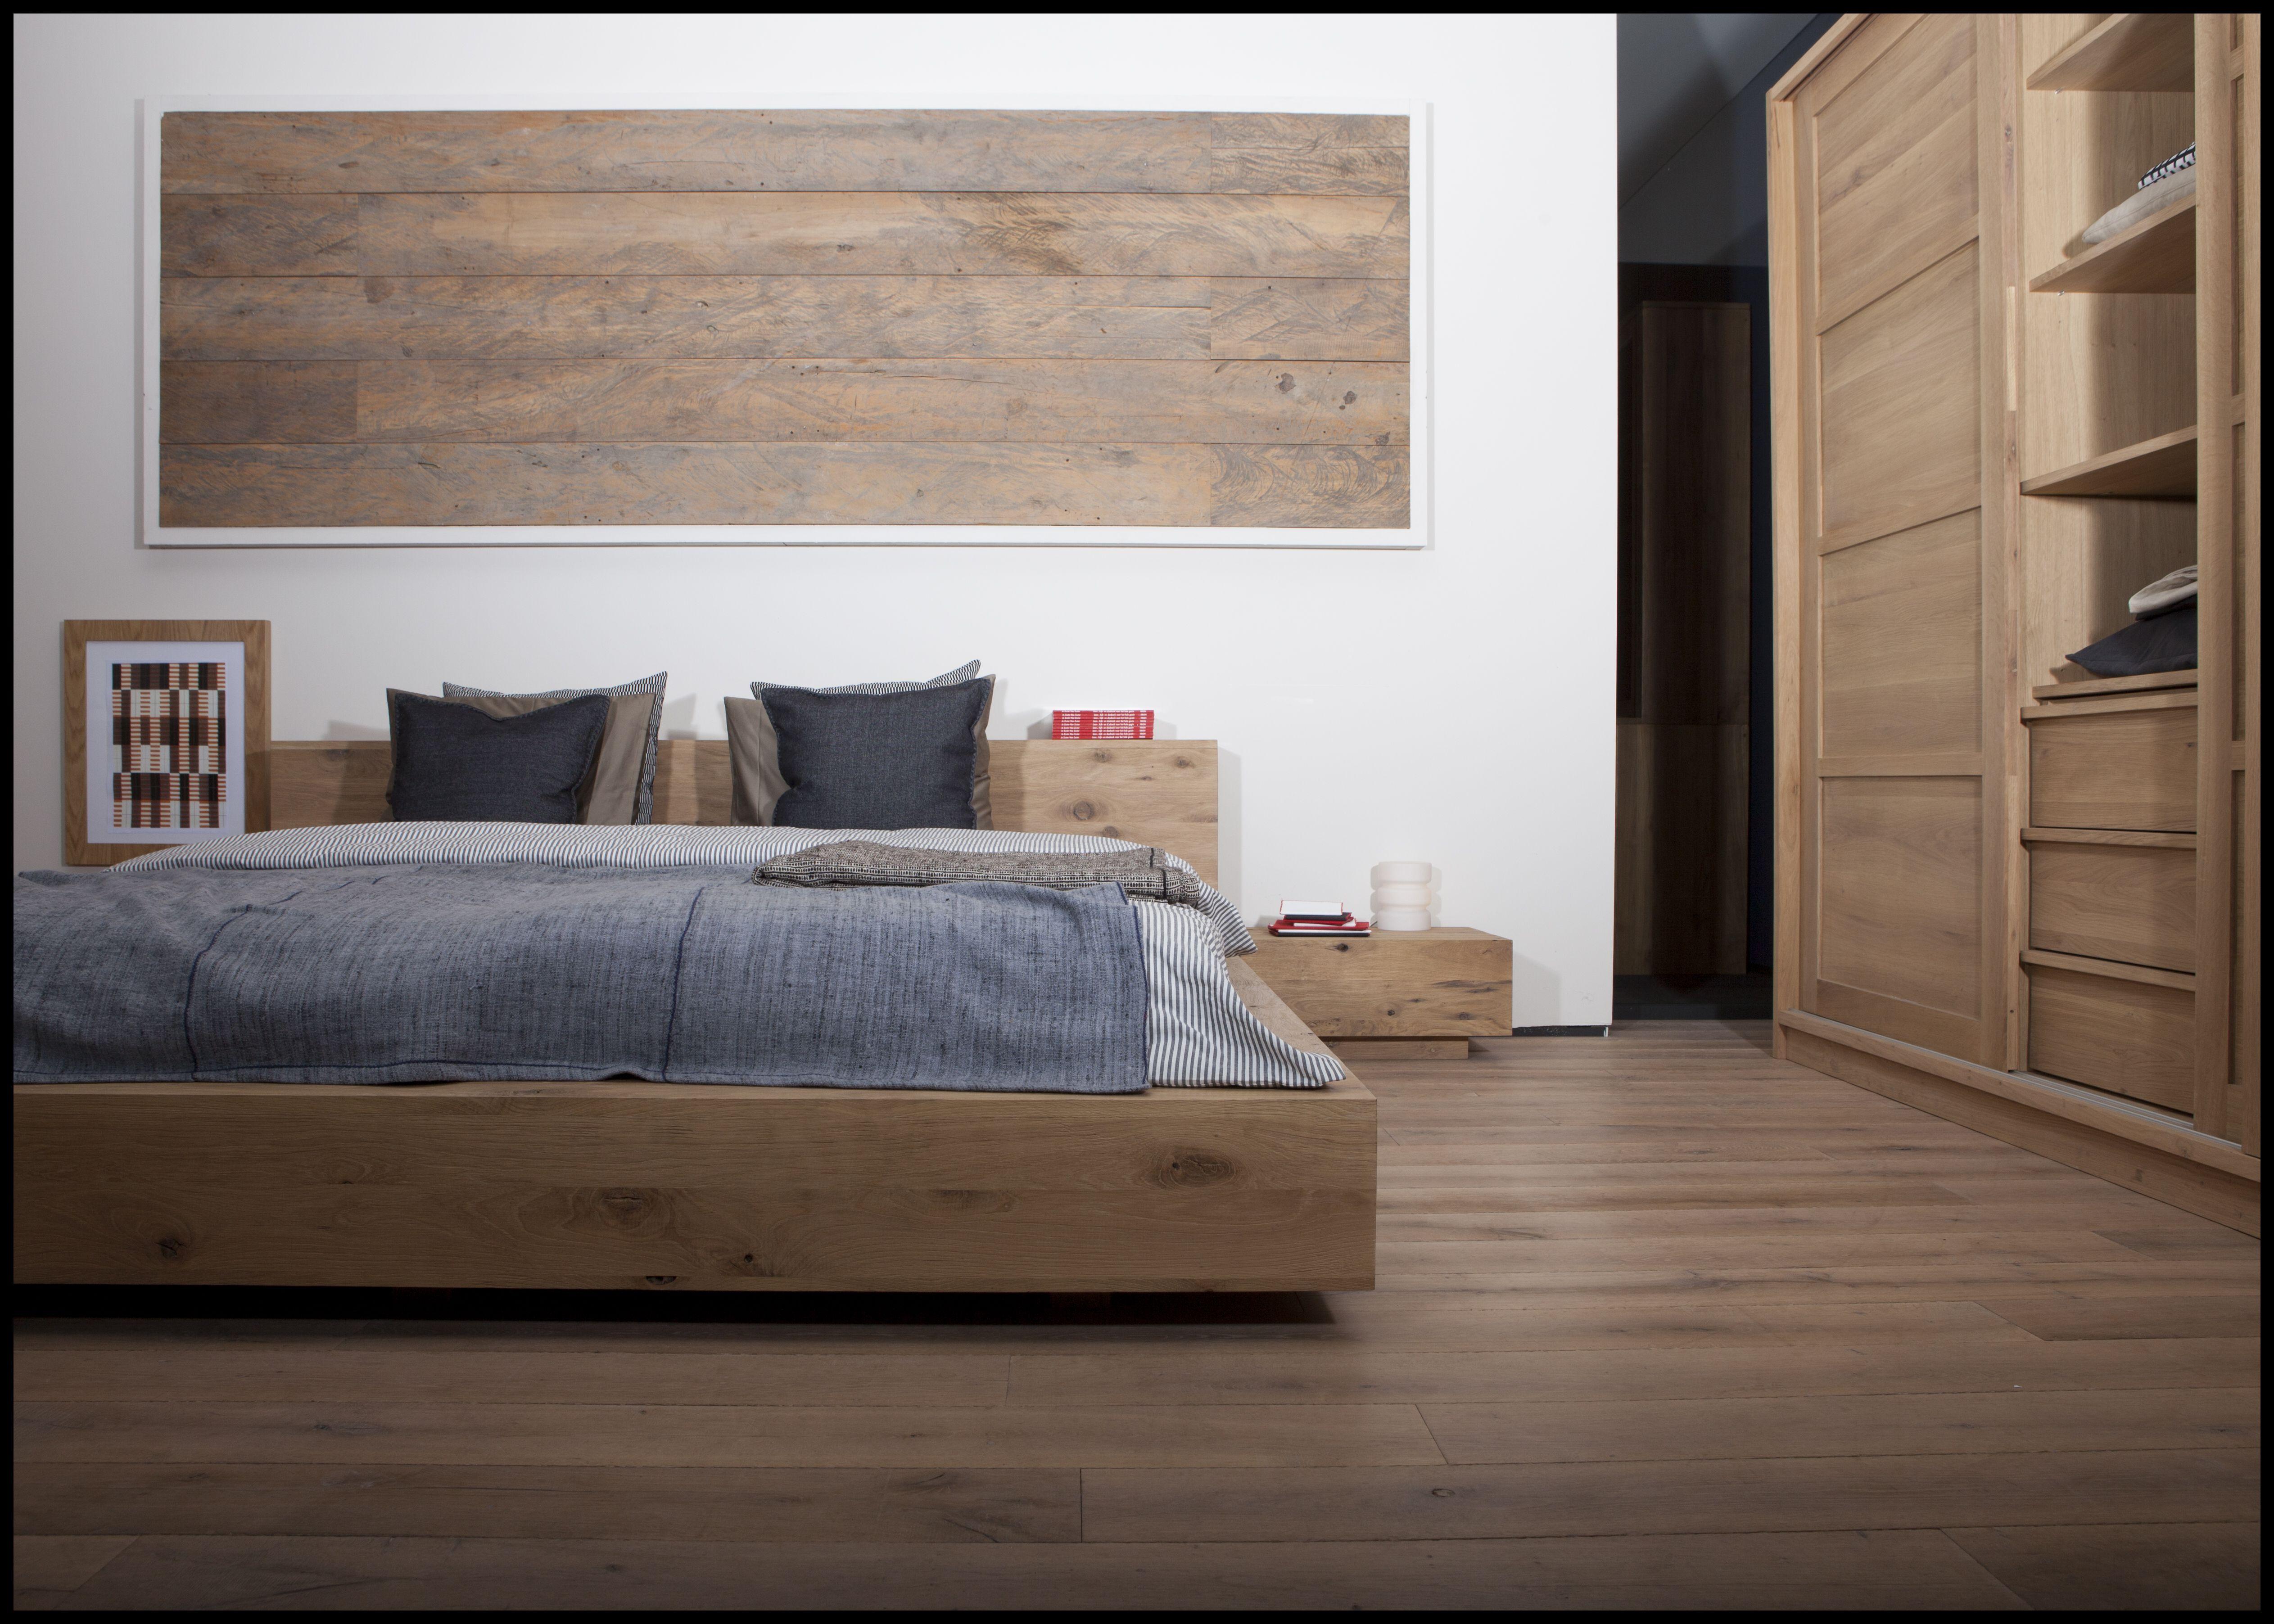 Madra Bed Ethnicraft : Ethnicraft showroom madra bedroom chambres